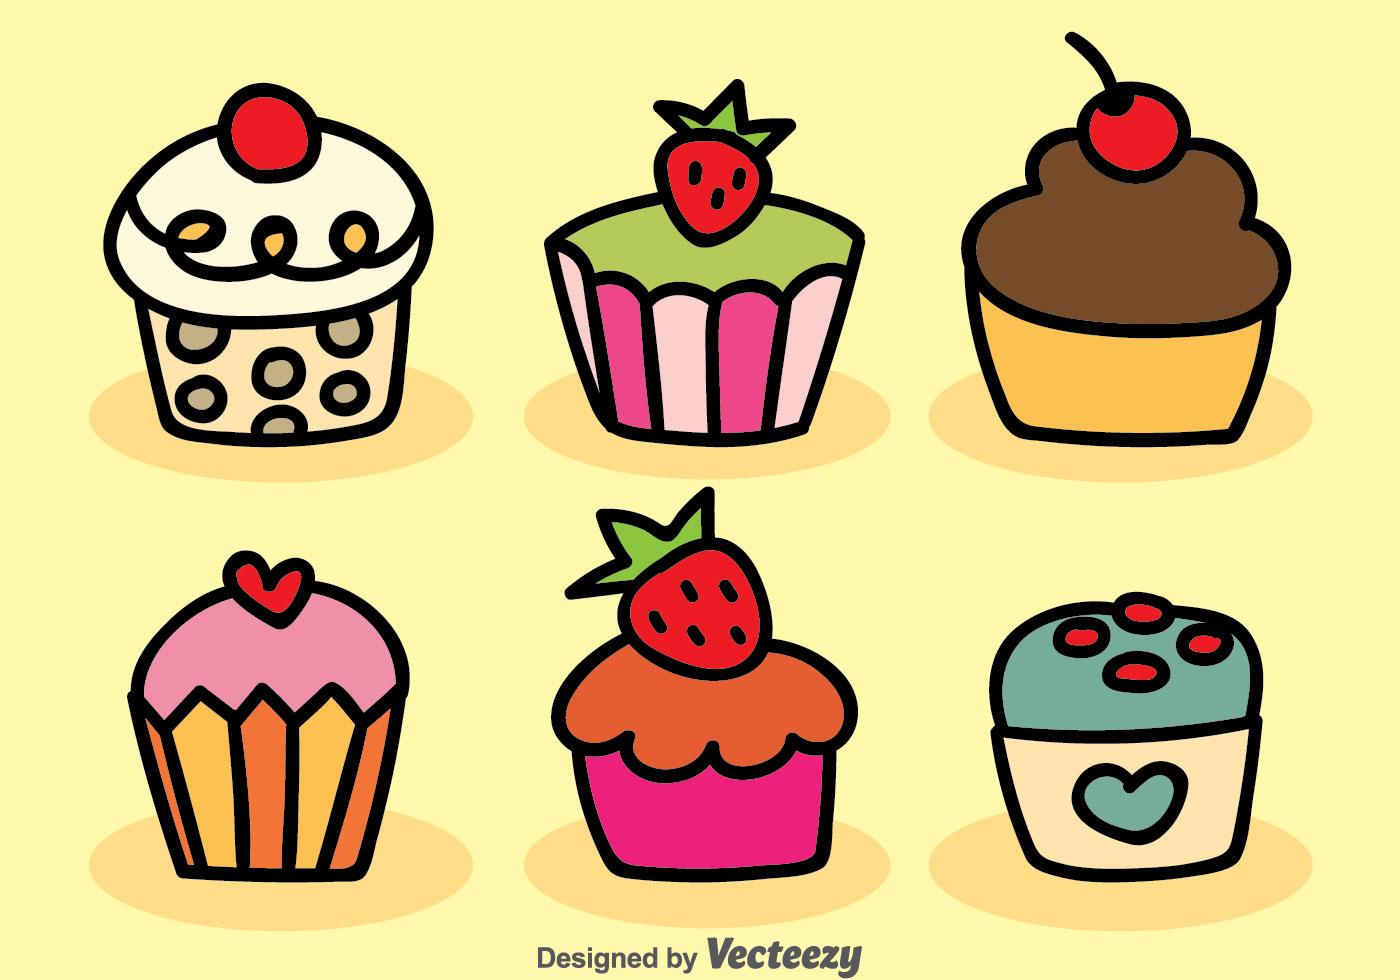 fruit cartoon free vector art 10785 free downloads rh vecteezy com Cupcake Clip Art Black and White Cupcake Clip Art